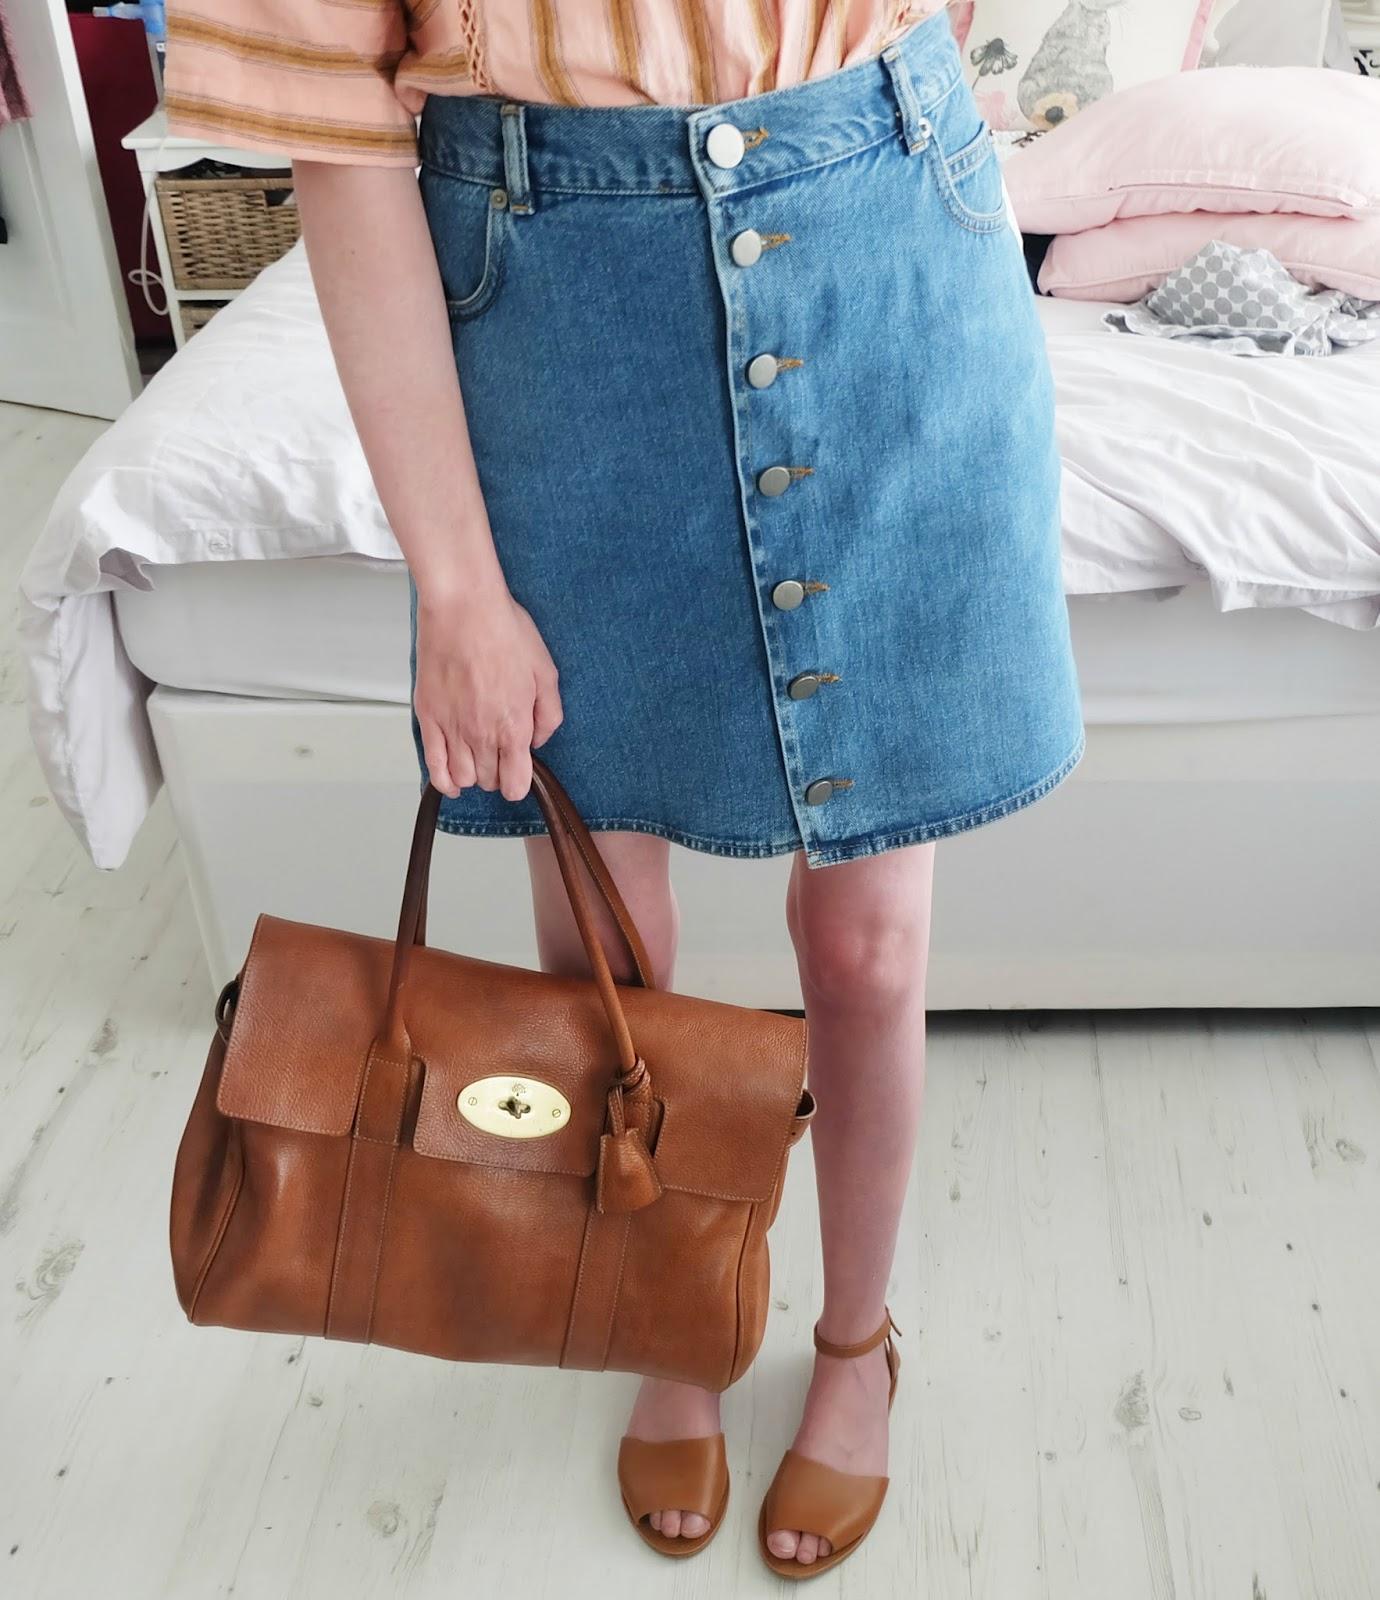 topshop stripe mix n match tee, aos denim dolly button through skirt, mulberry bayswater bag outfit, cystic fibrosis transplant blog uk, uk fashion blog, sick chick chic blog